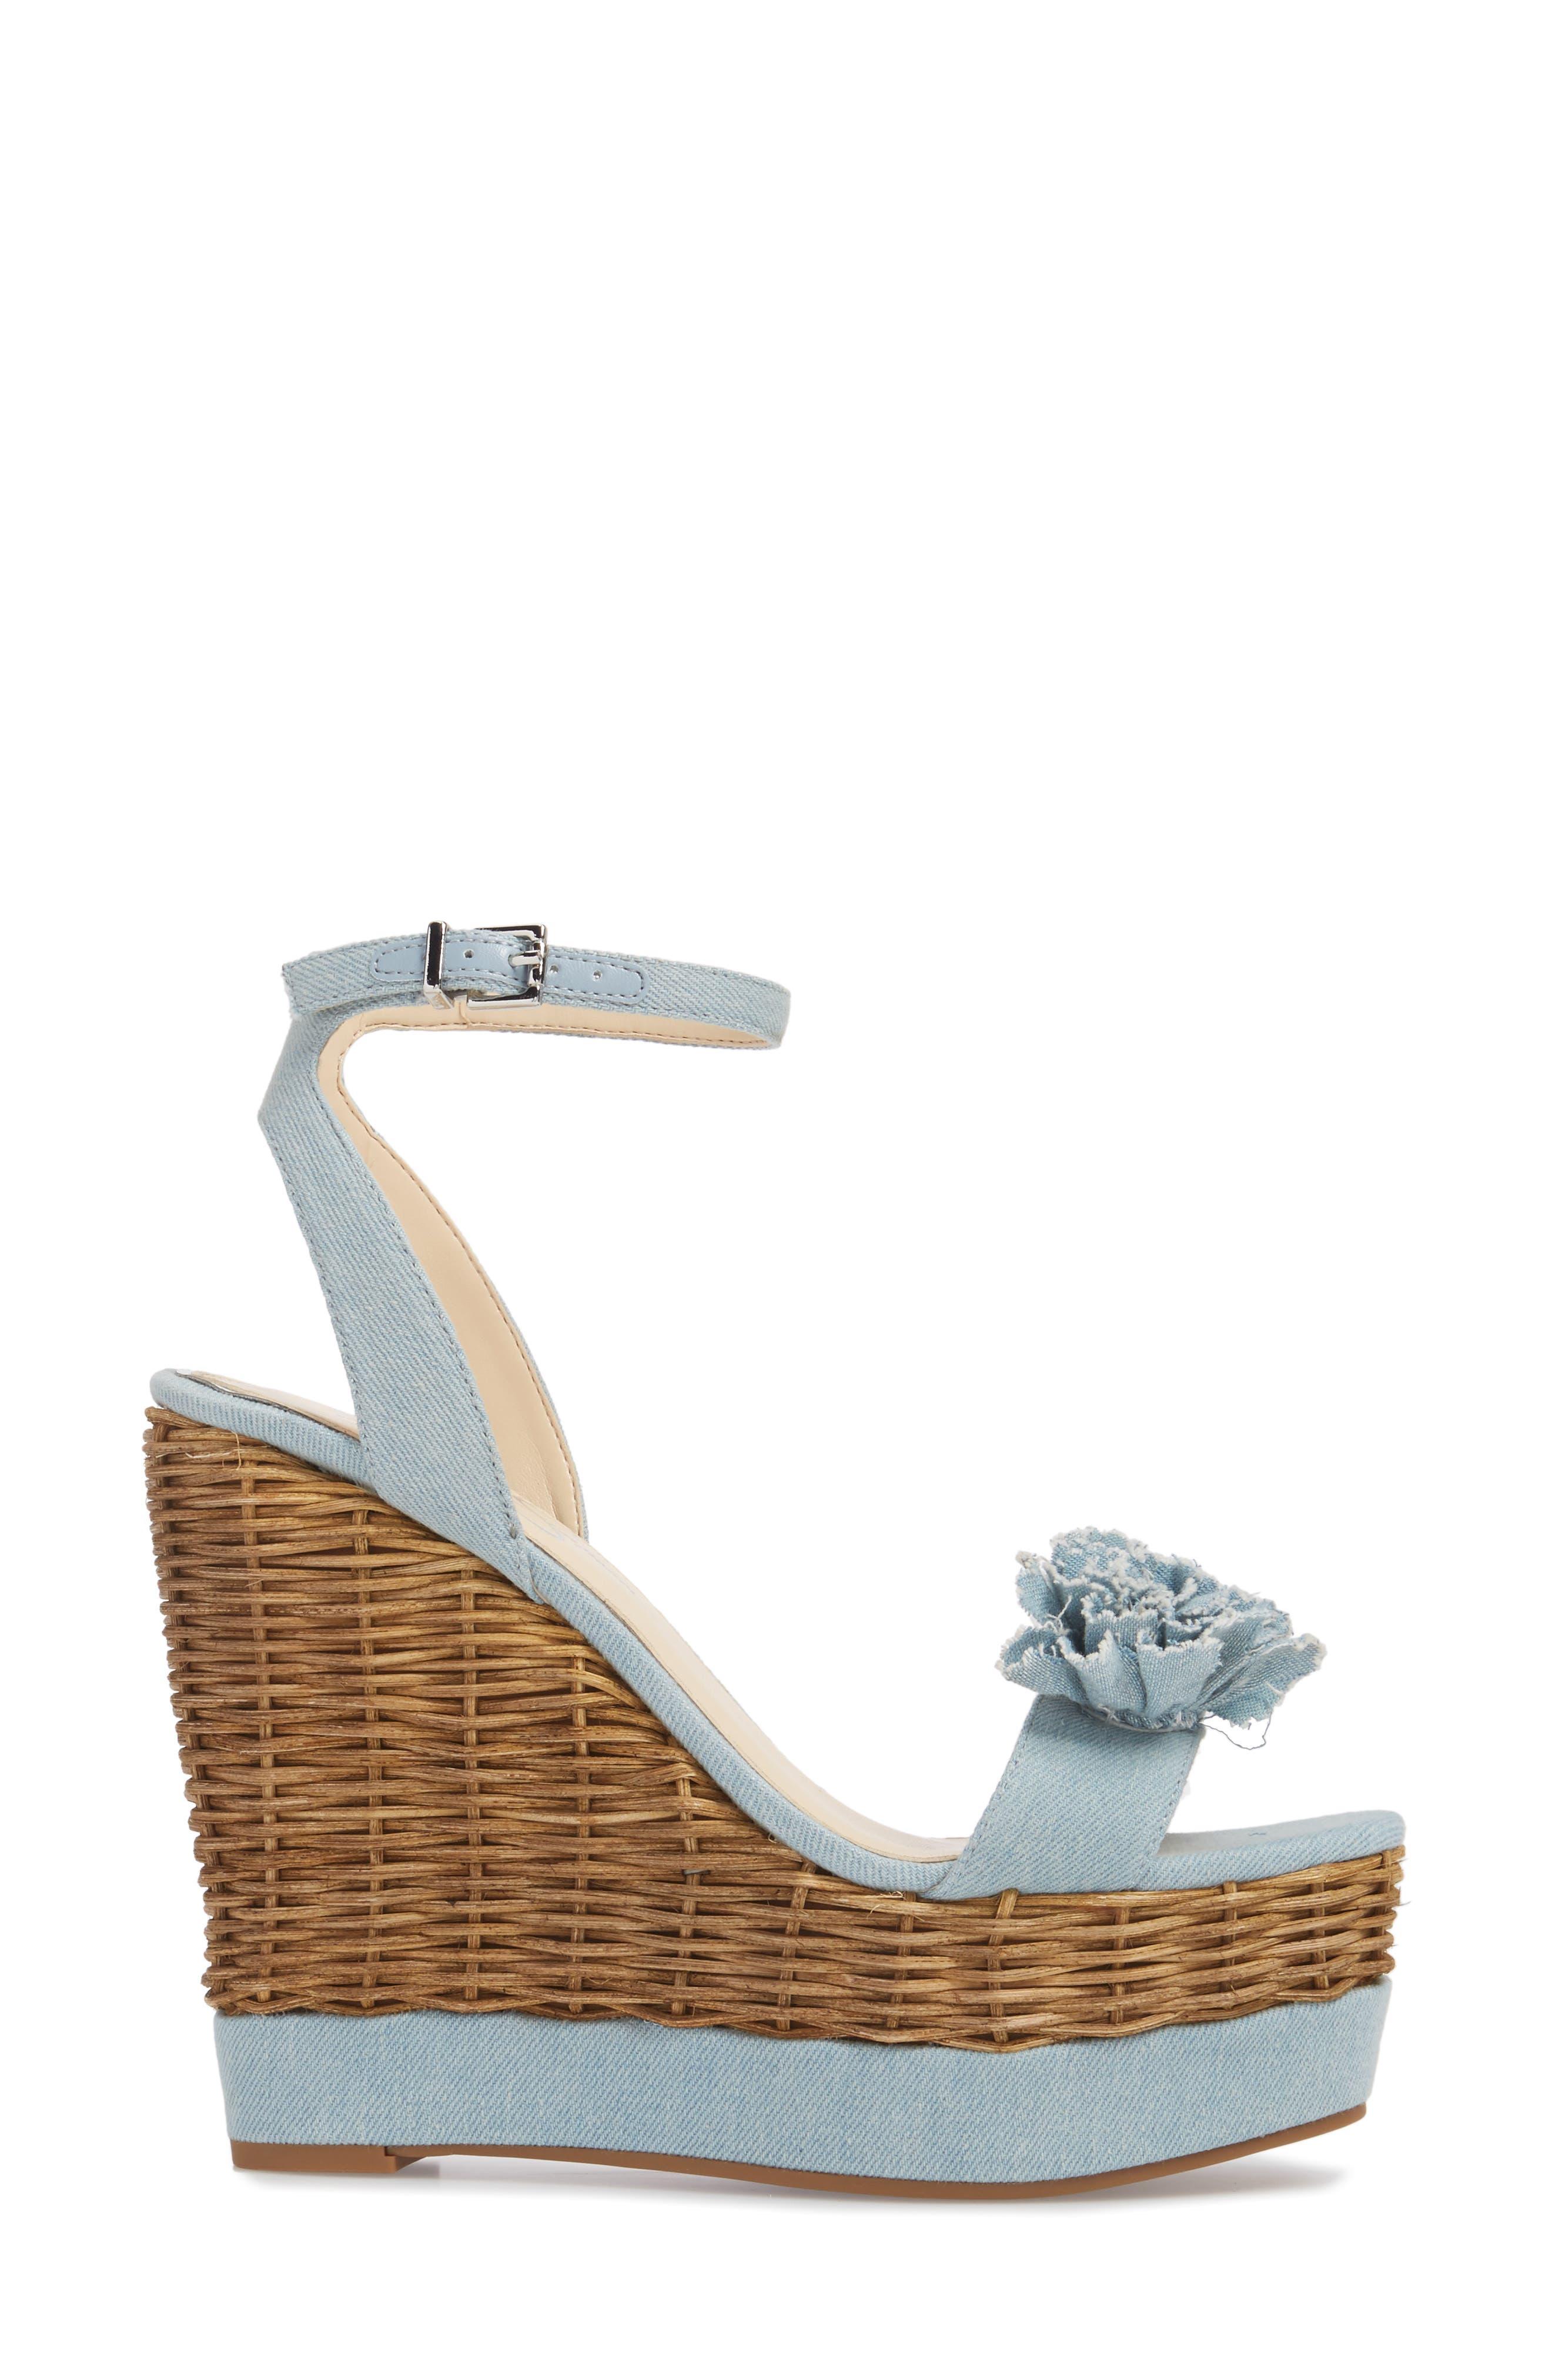 Pressa Platform Wedge Sandal,                             Alternate thumbnail 3, color,                             VINTAGE BLUE